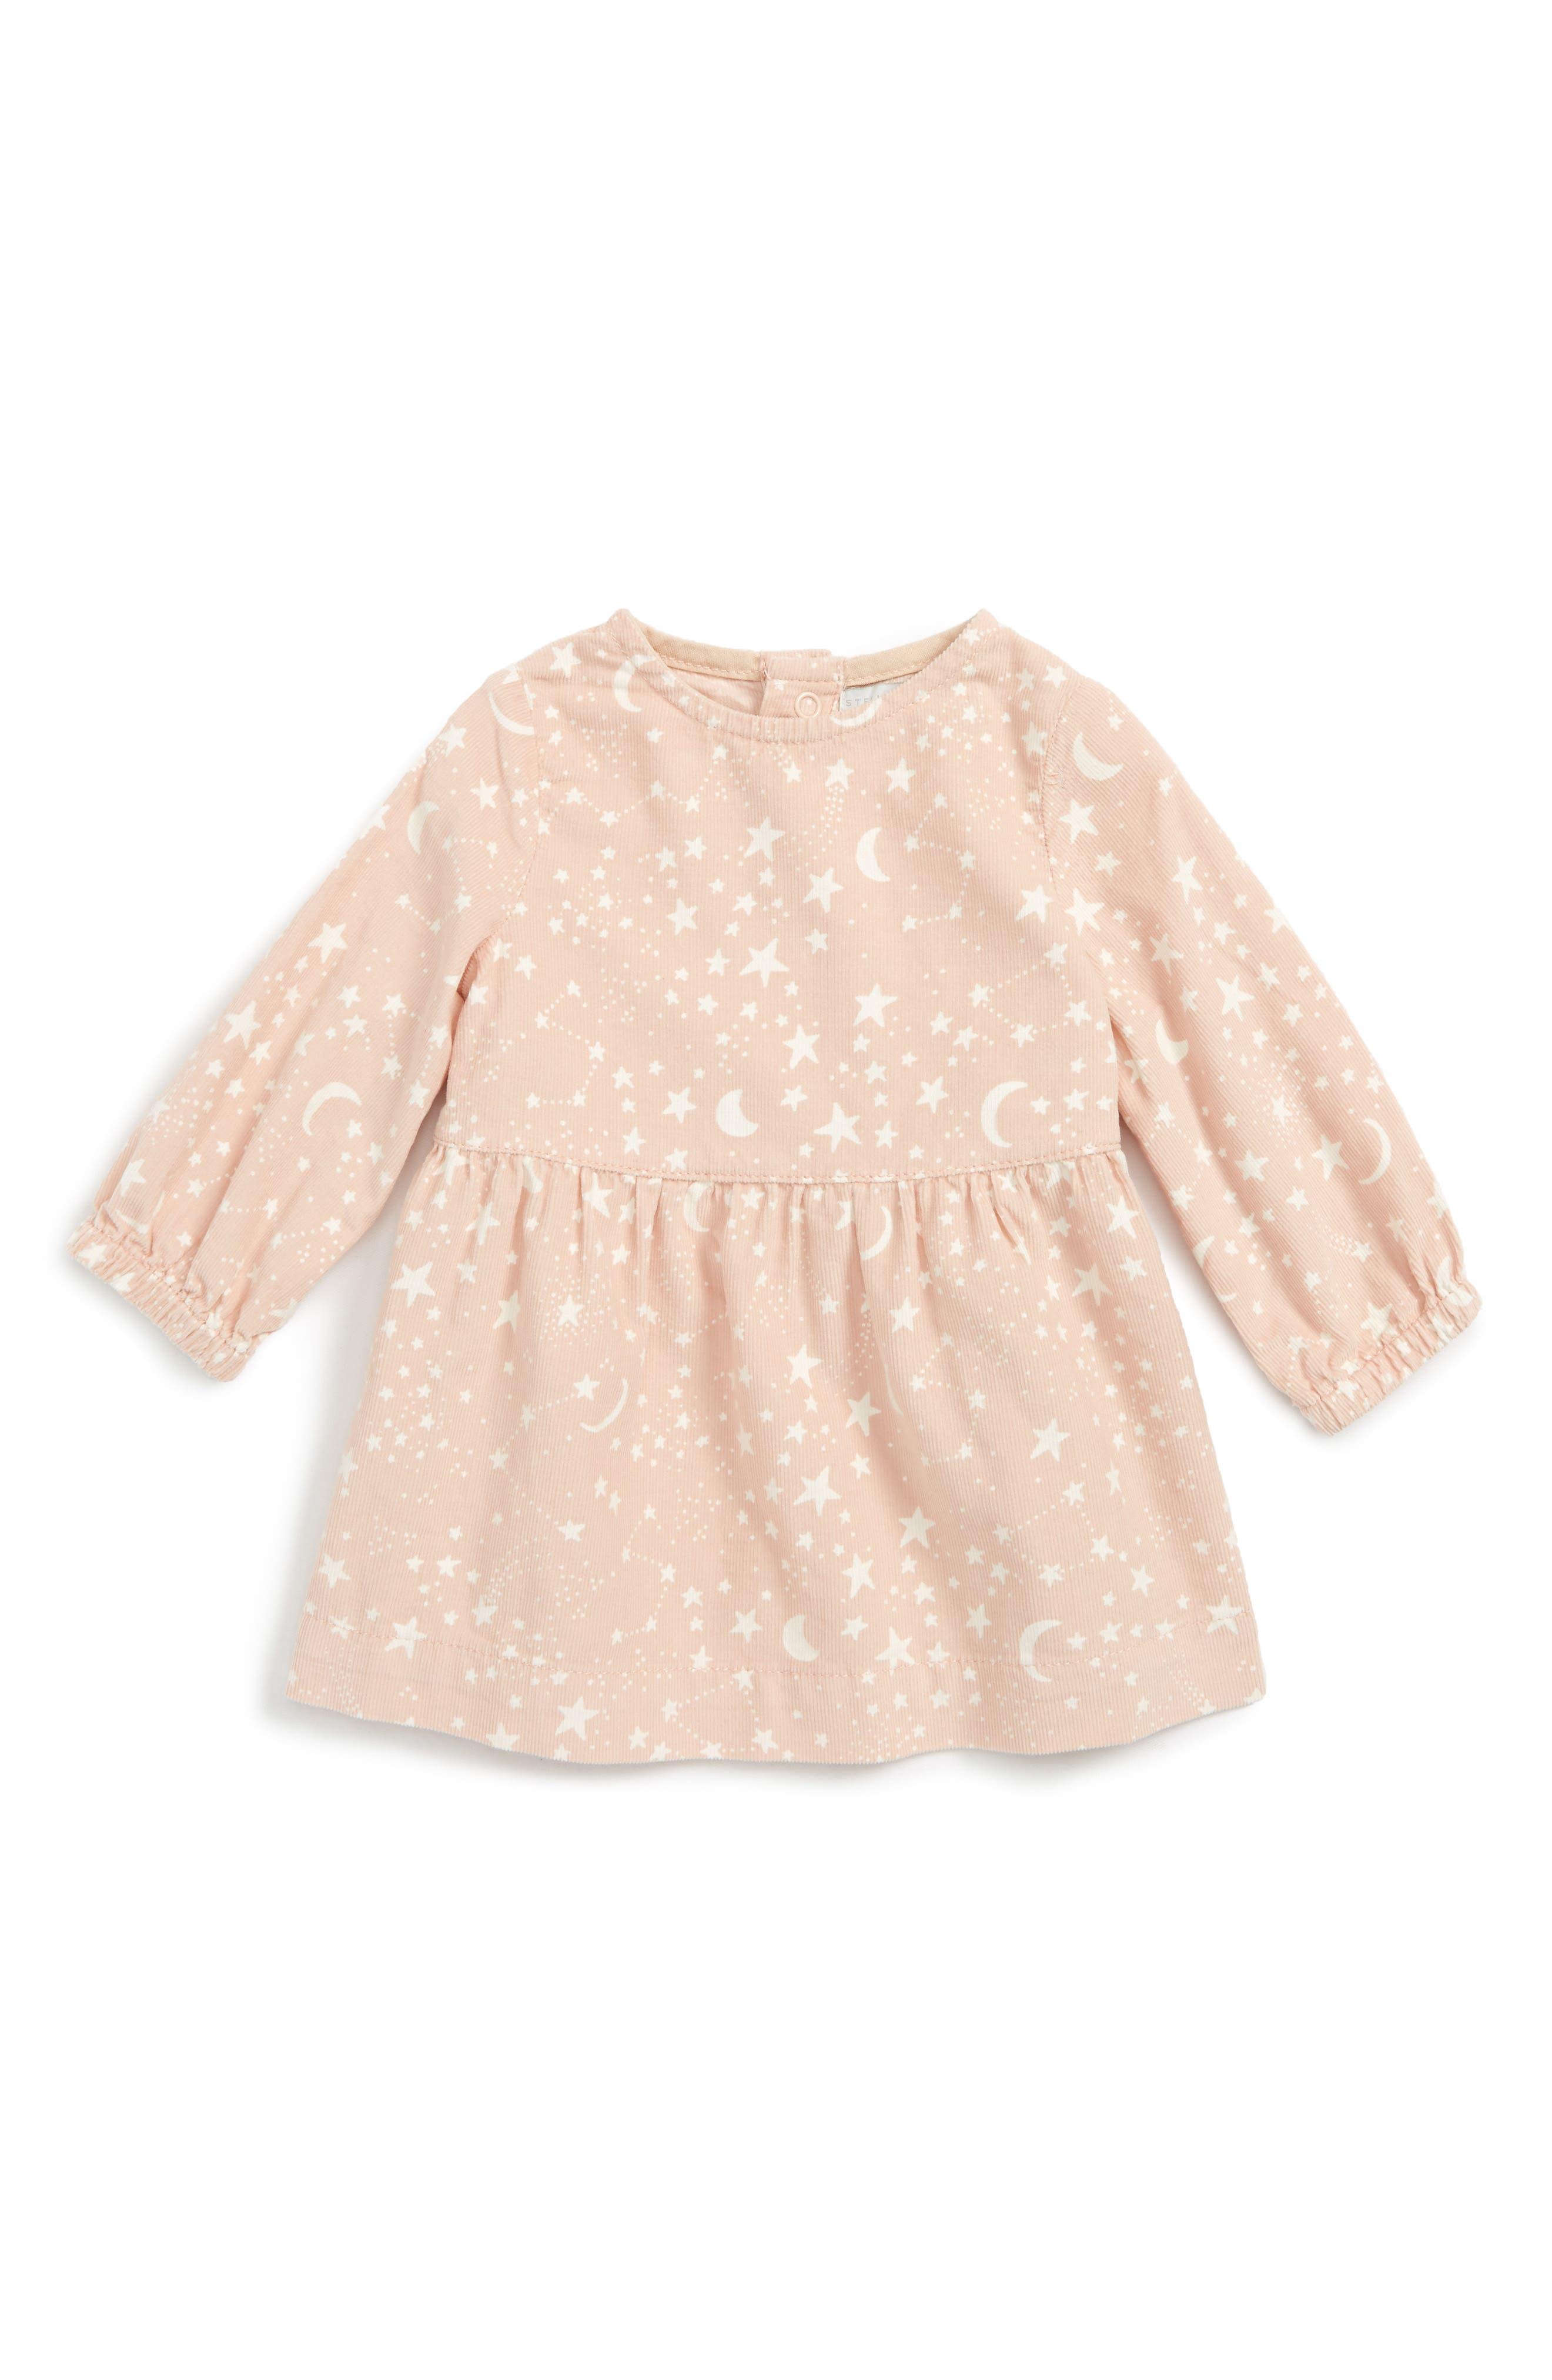 Skippy Star Print Dress,                         Main,                         color, 650